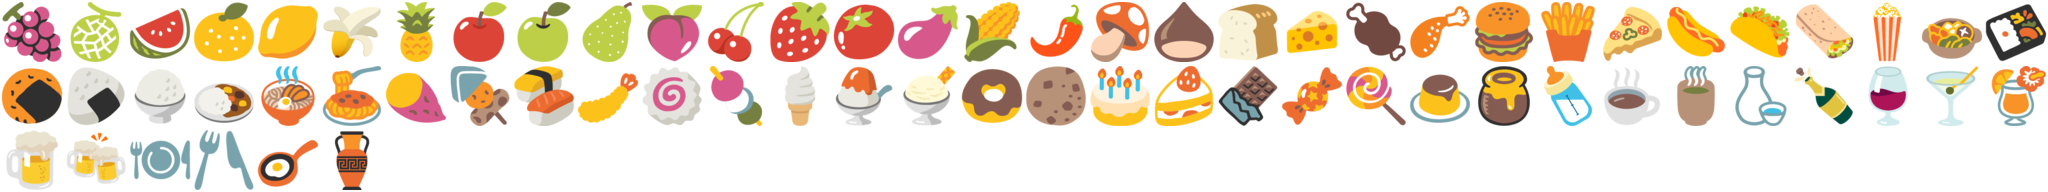 briar-android/src/main/assets/emoji_food_drink.png